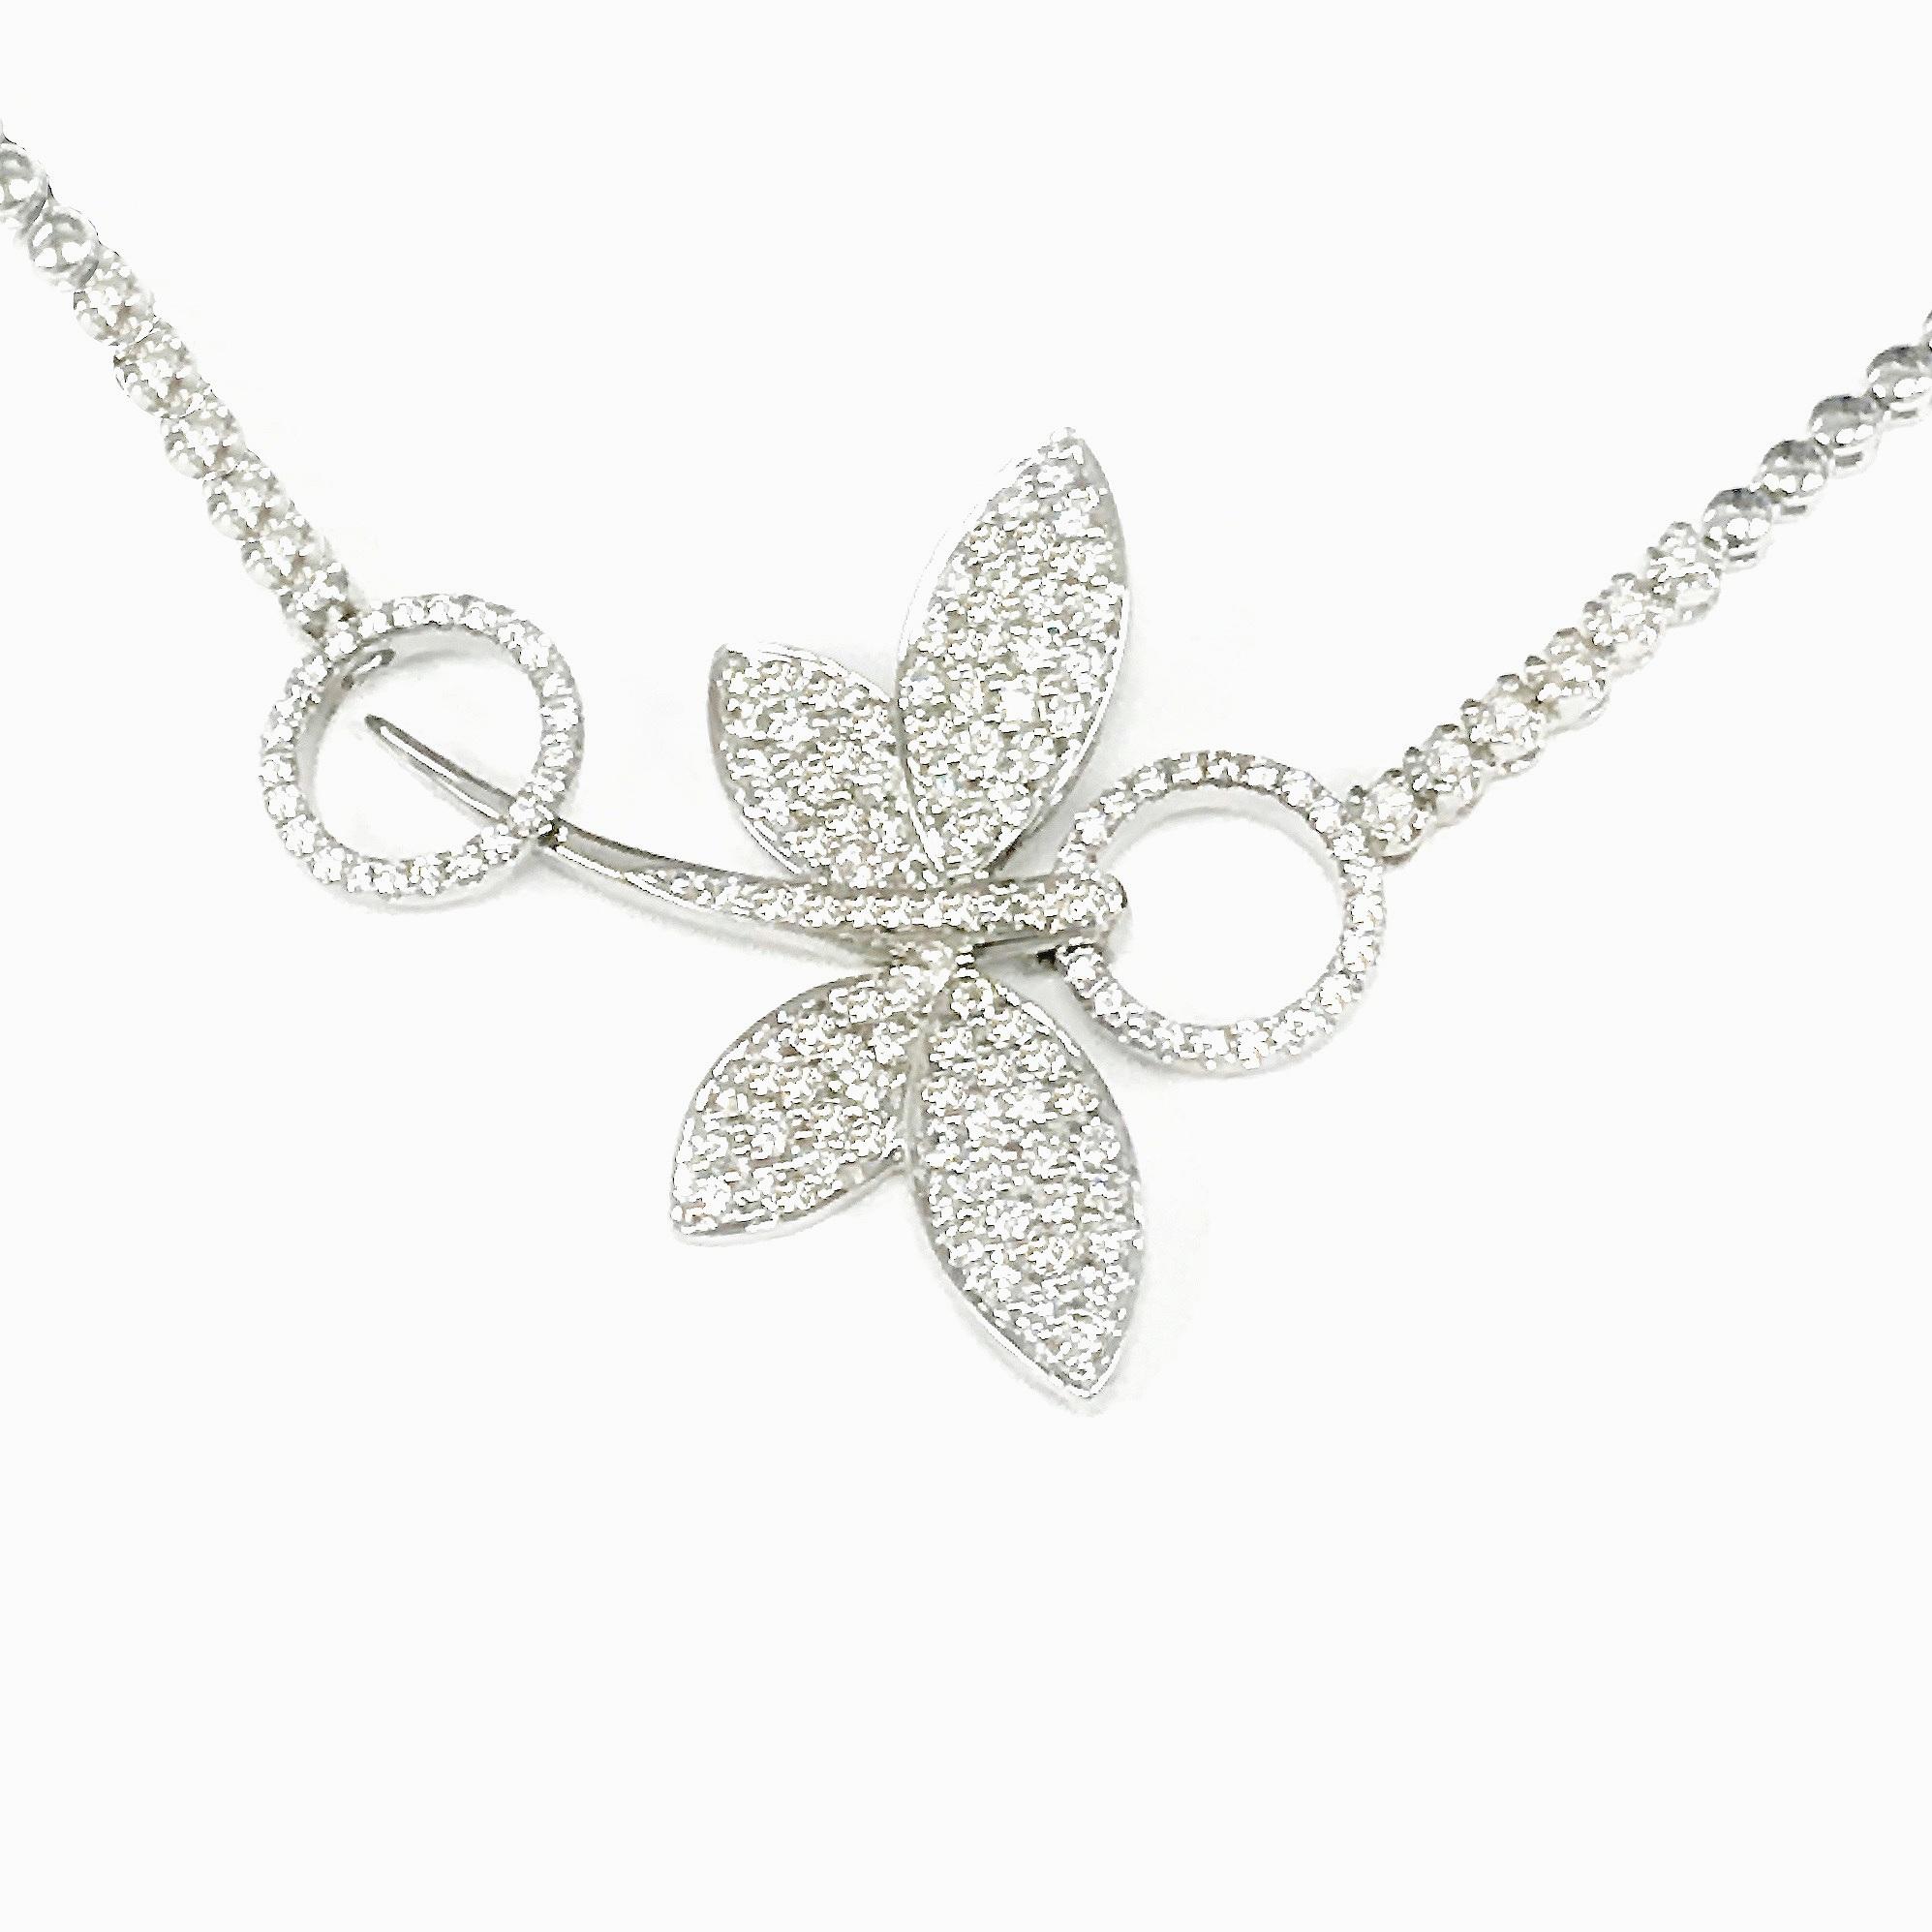 TJ_dragonfly_diamond_necklace.jpg